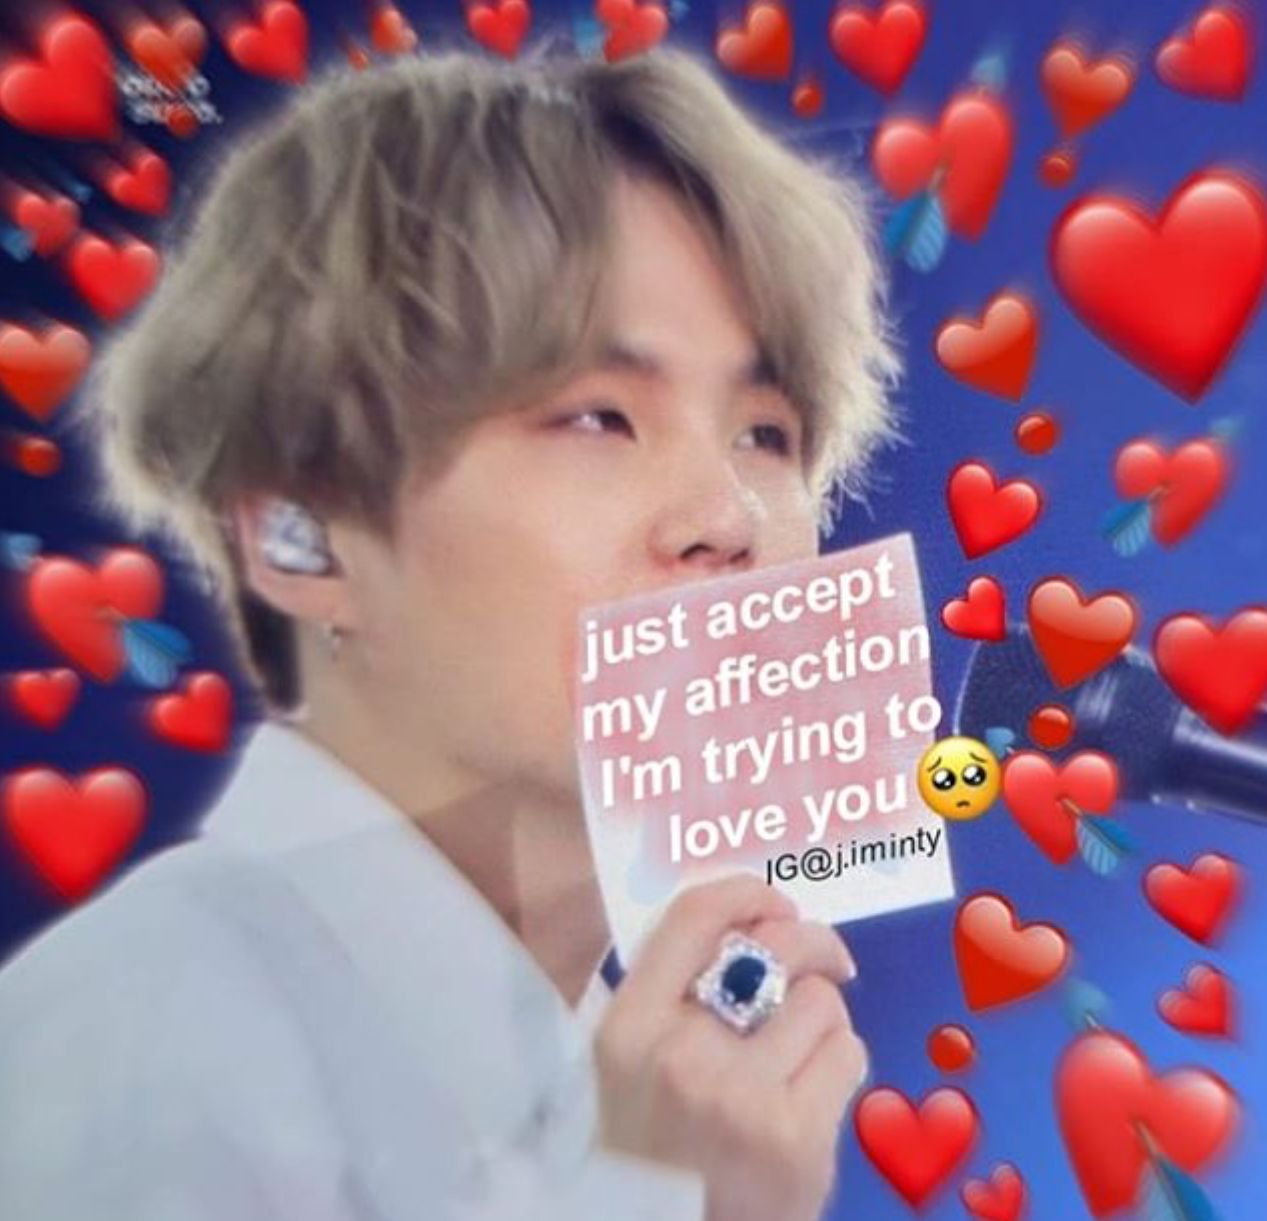 Pin By Dansp On K Pop Memes Bts Memes Kpop Memes Love Memes